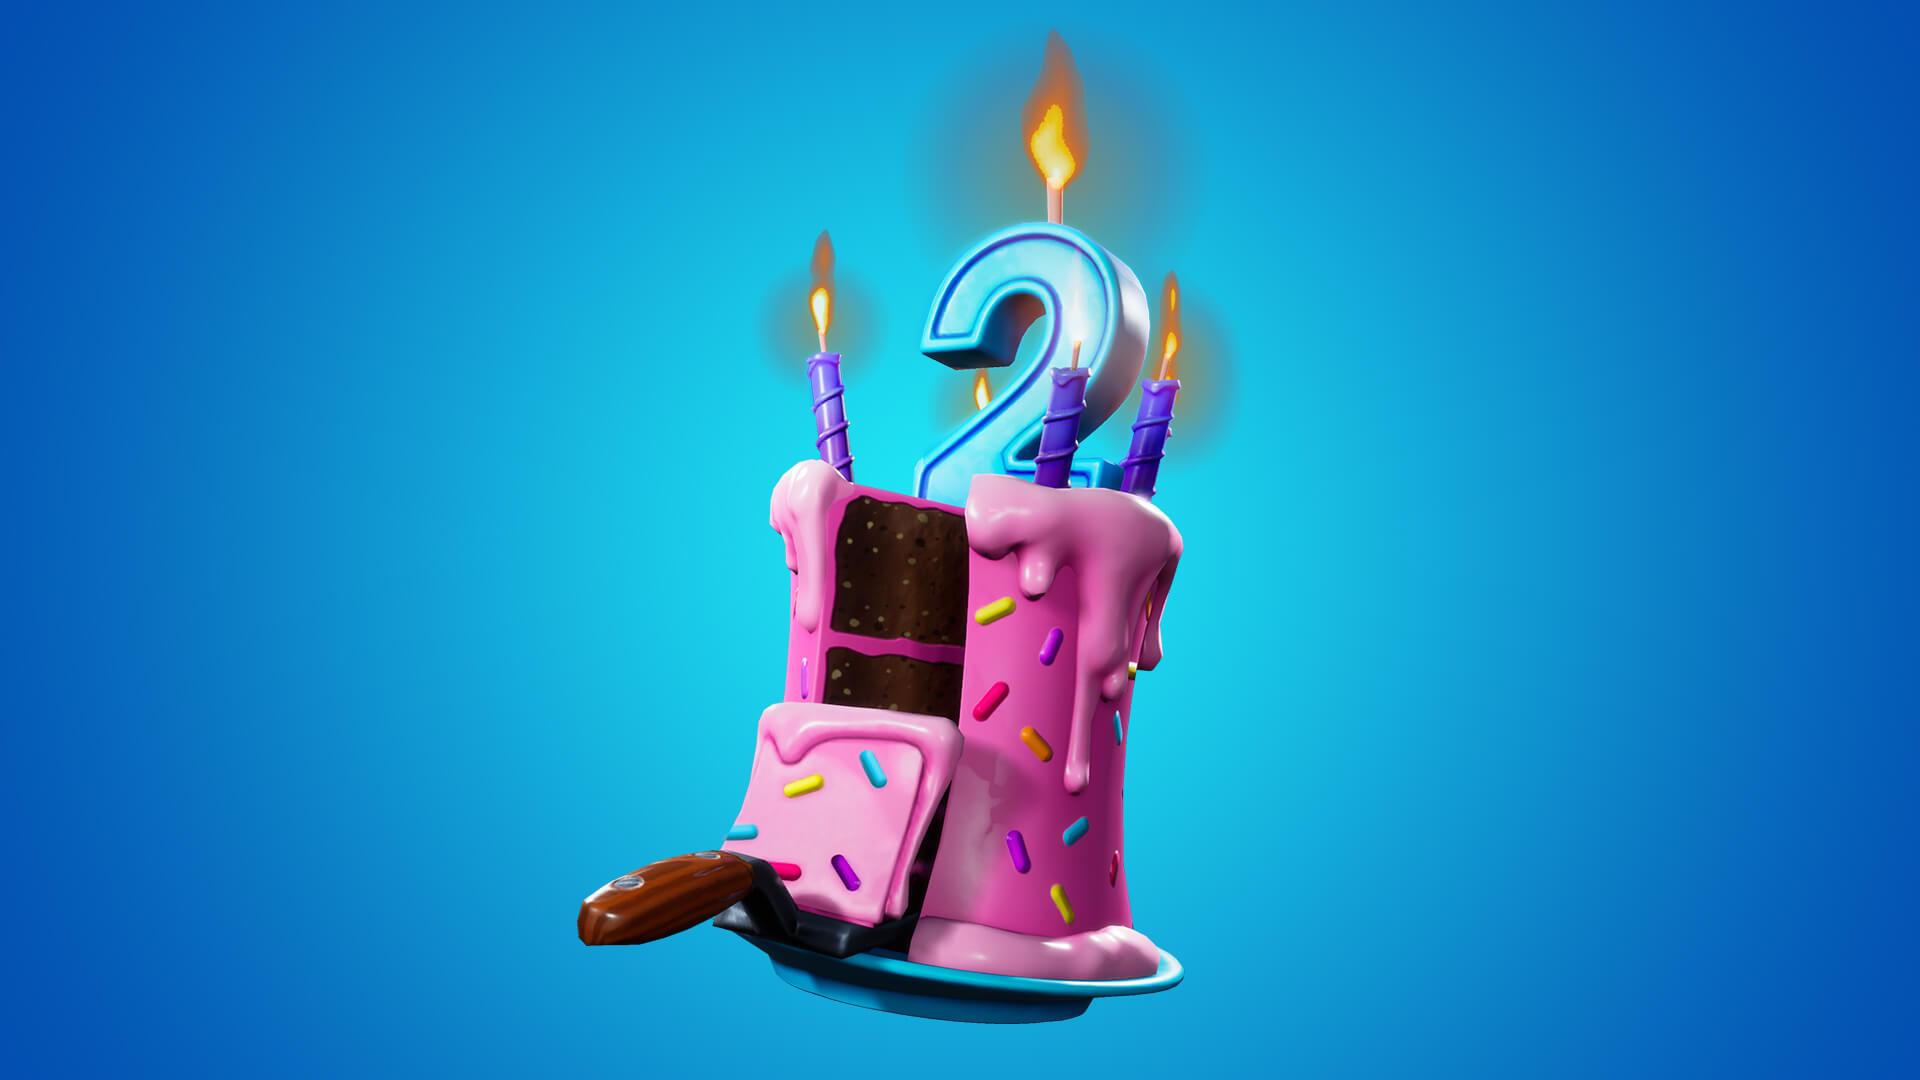 09BR_Birthday_Cake_NewsHeader.jpg